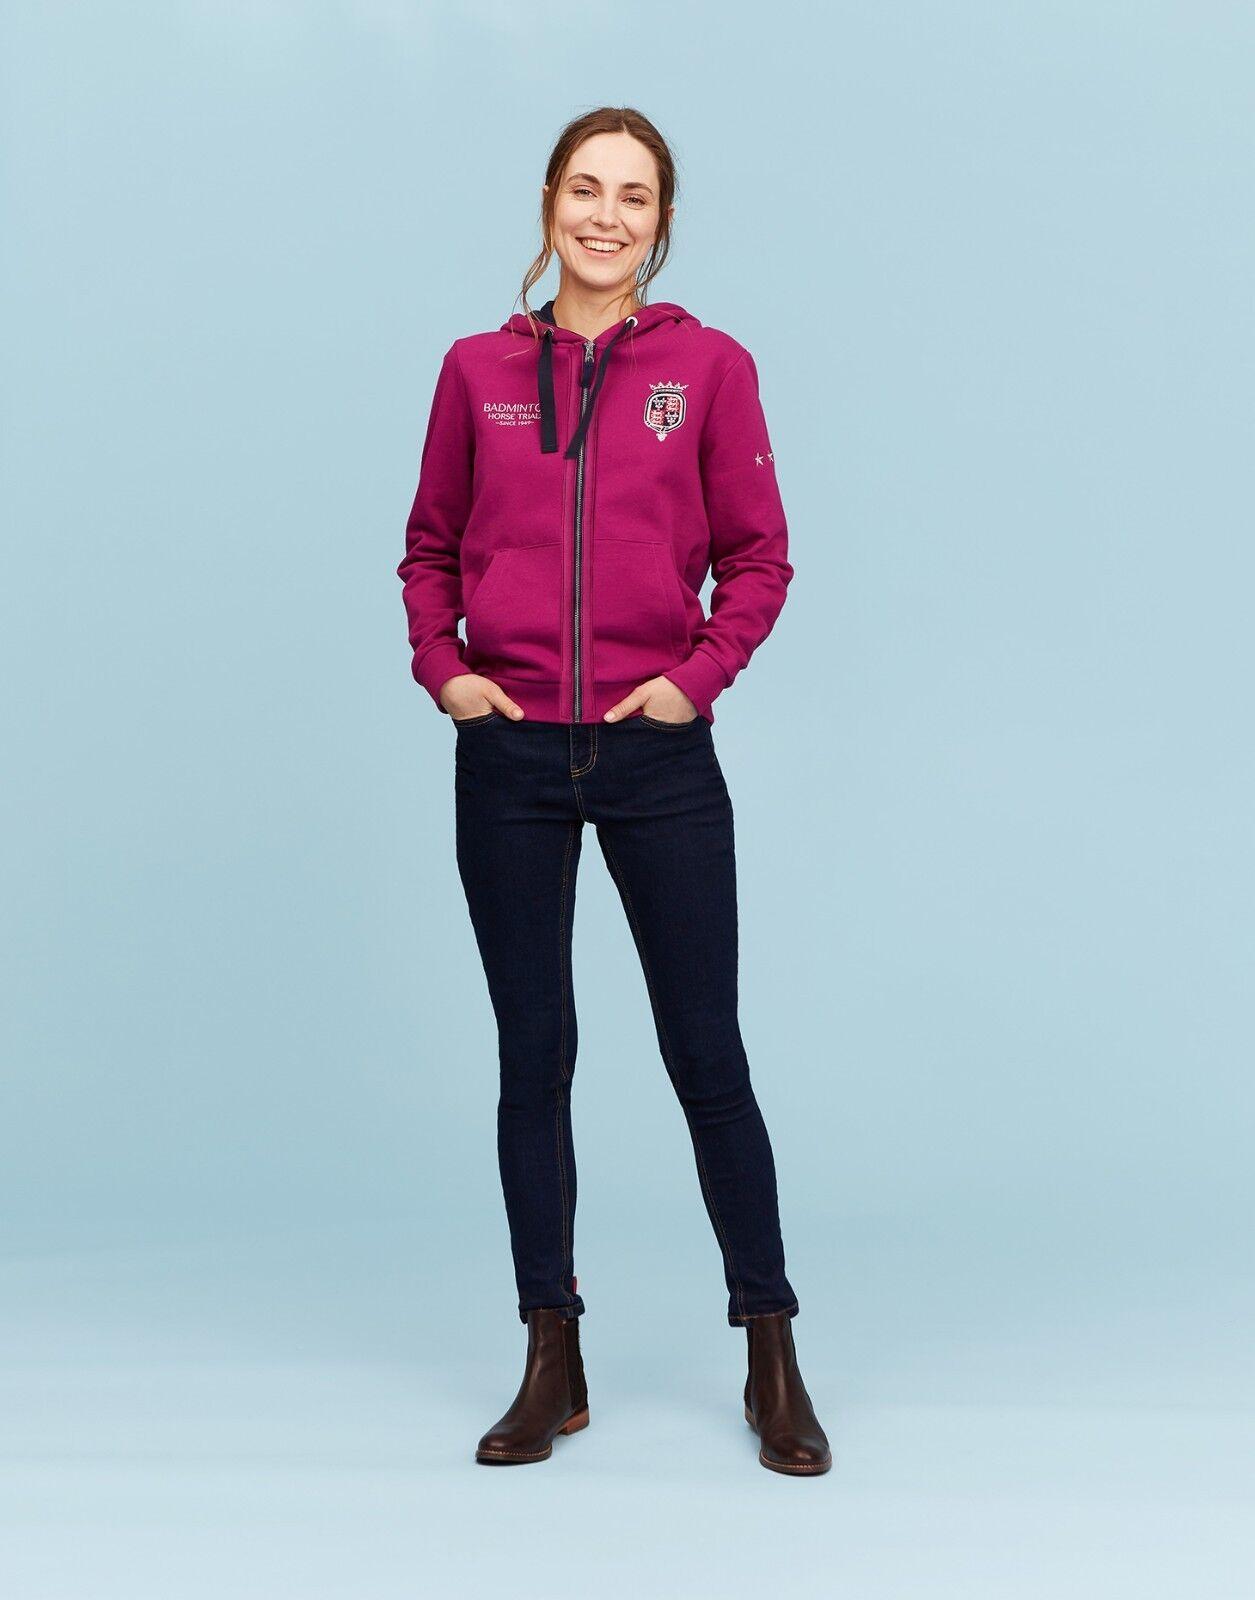 SALE Joules Official Badminton Ladies Sweatshirt - Jewel